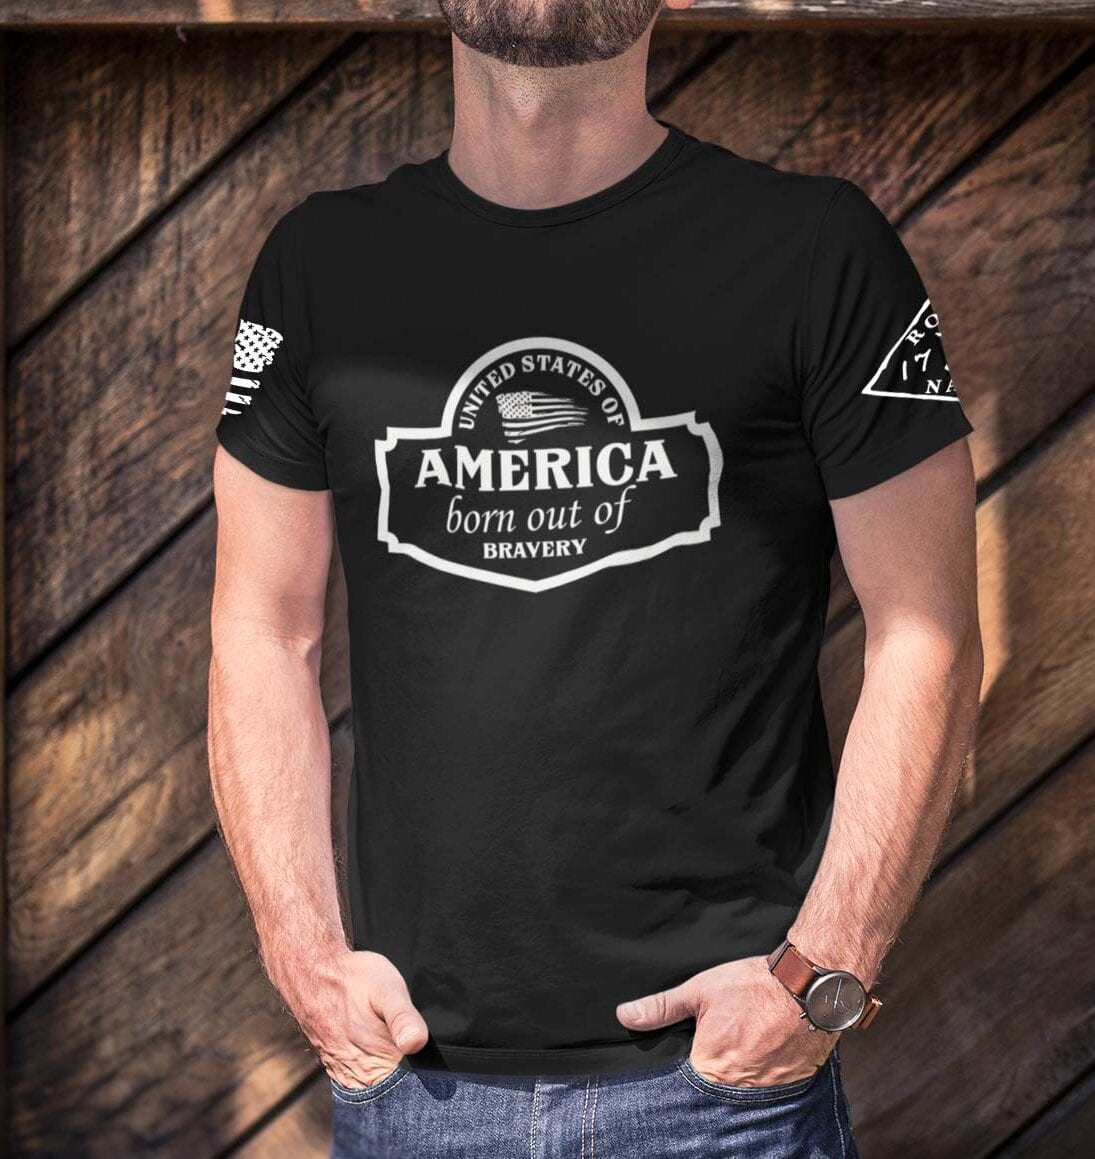 September Club Shirt on Mens Black T-Shirt